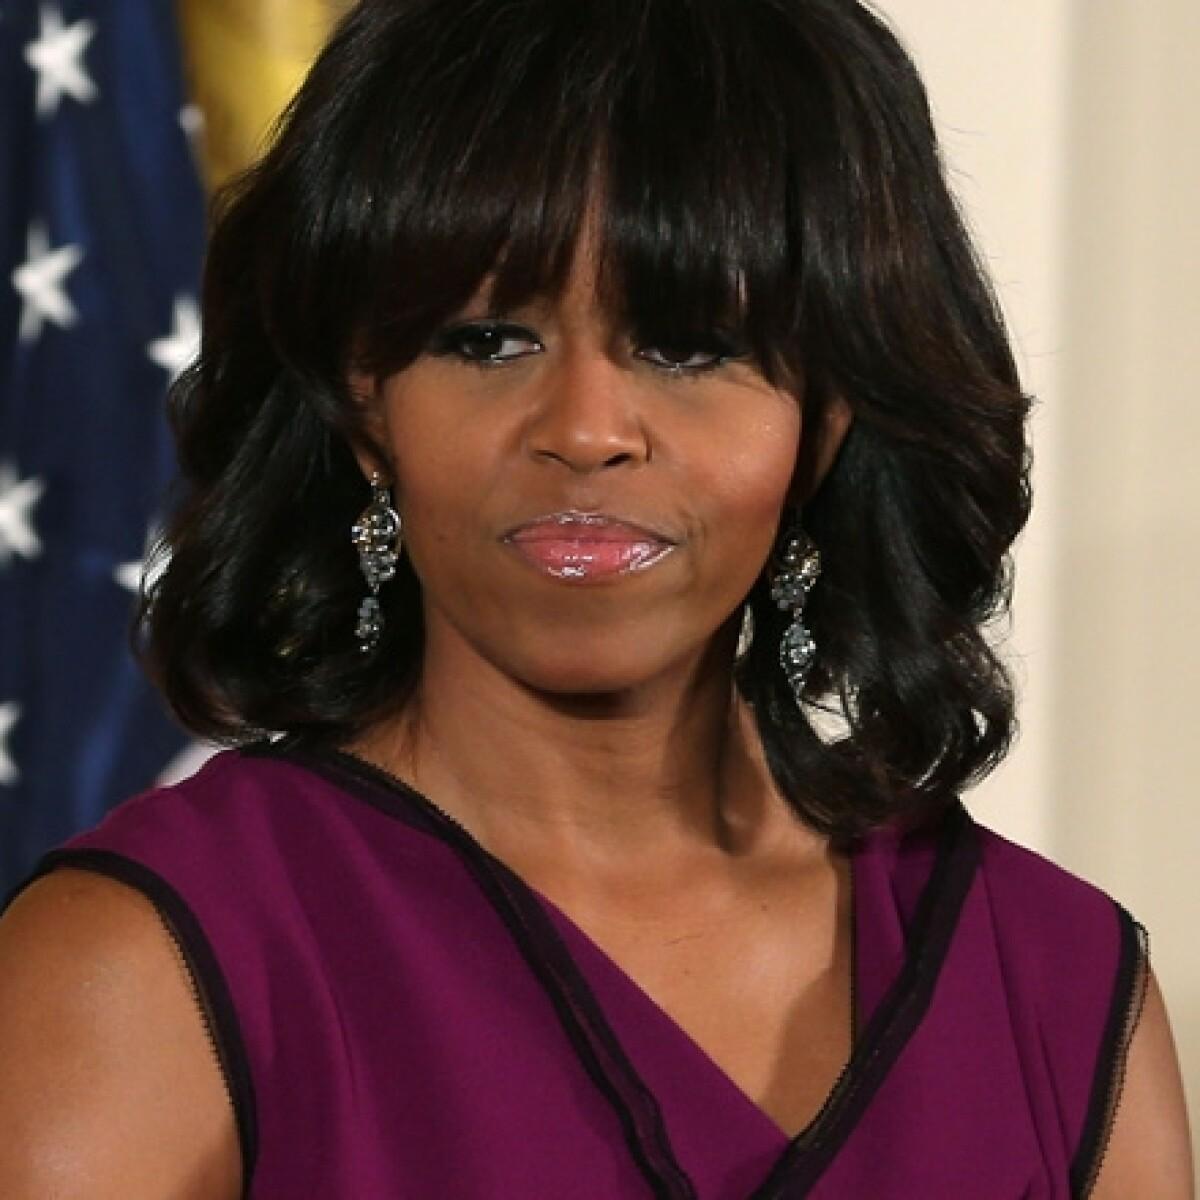 Michelle Obama, furiosa por ser interrumpida durante discurso